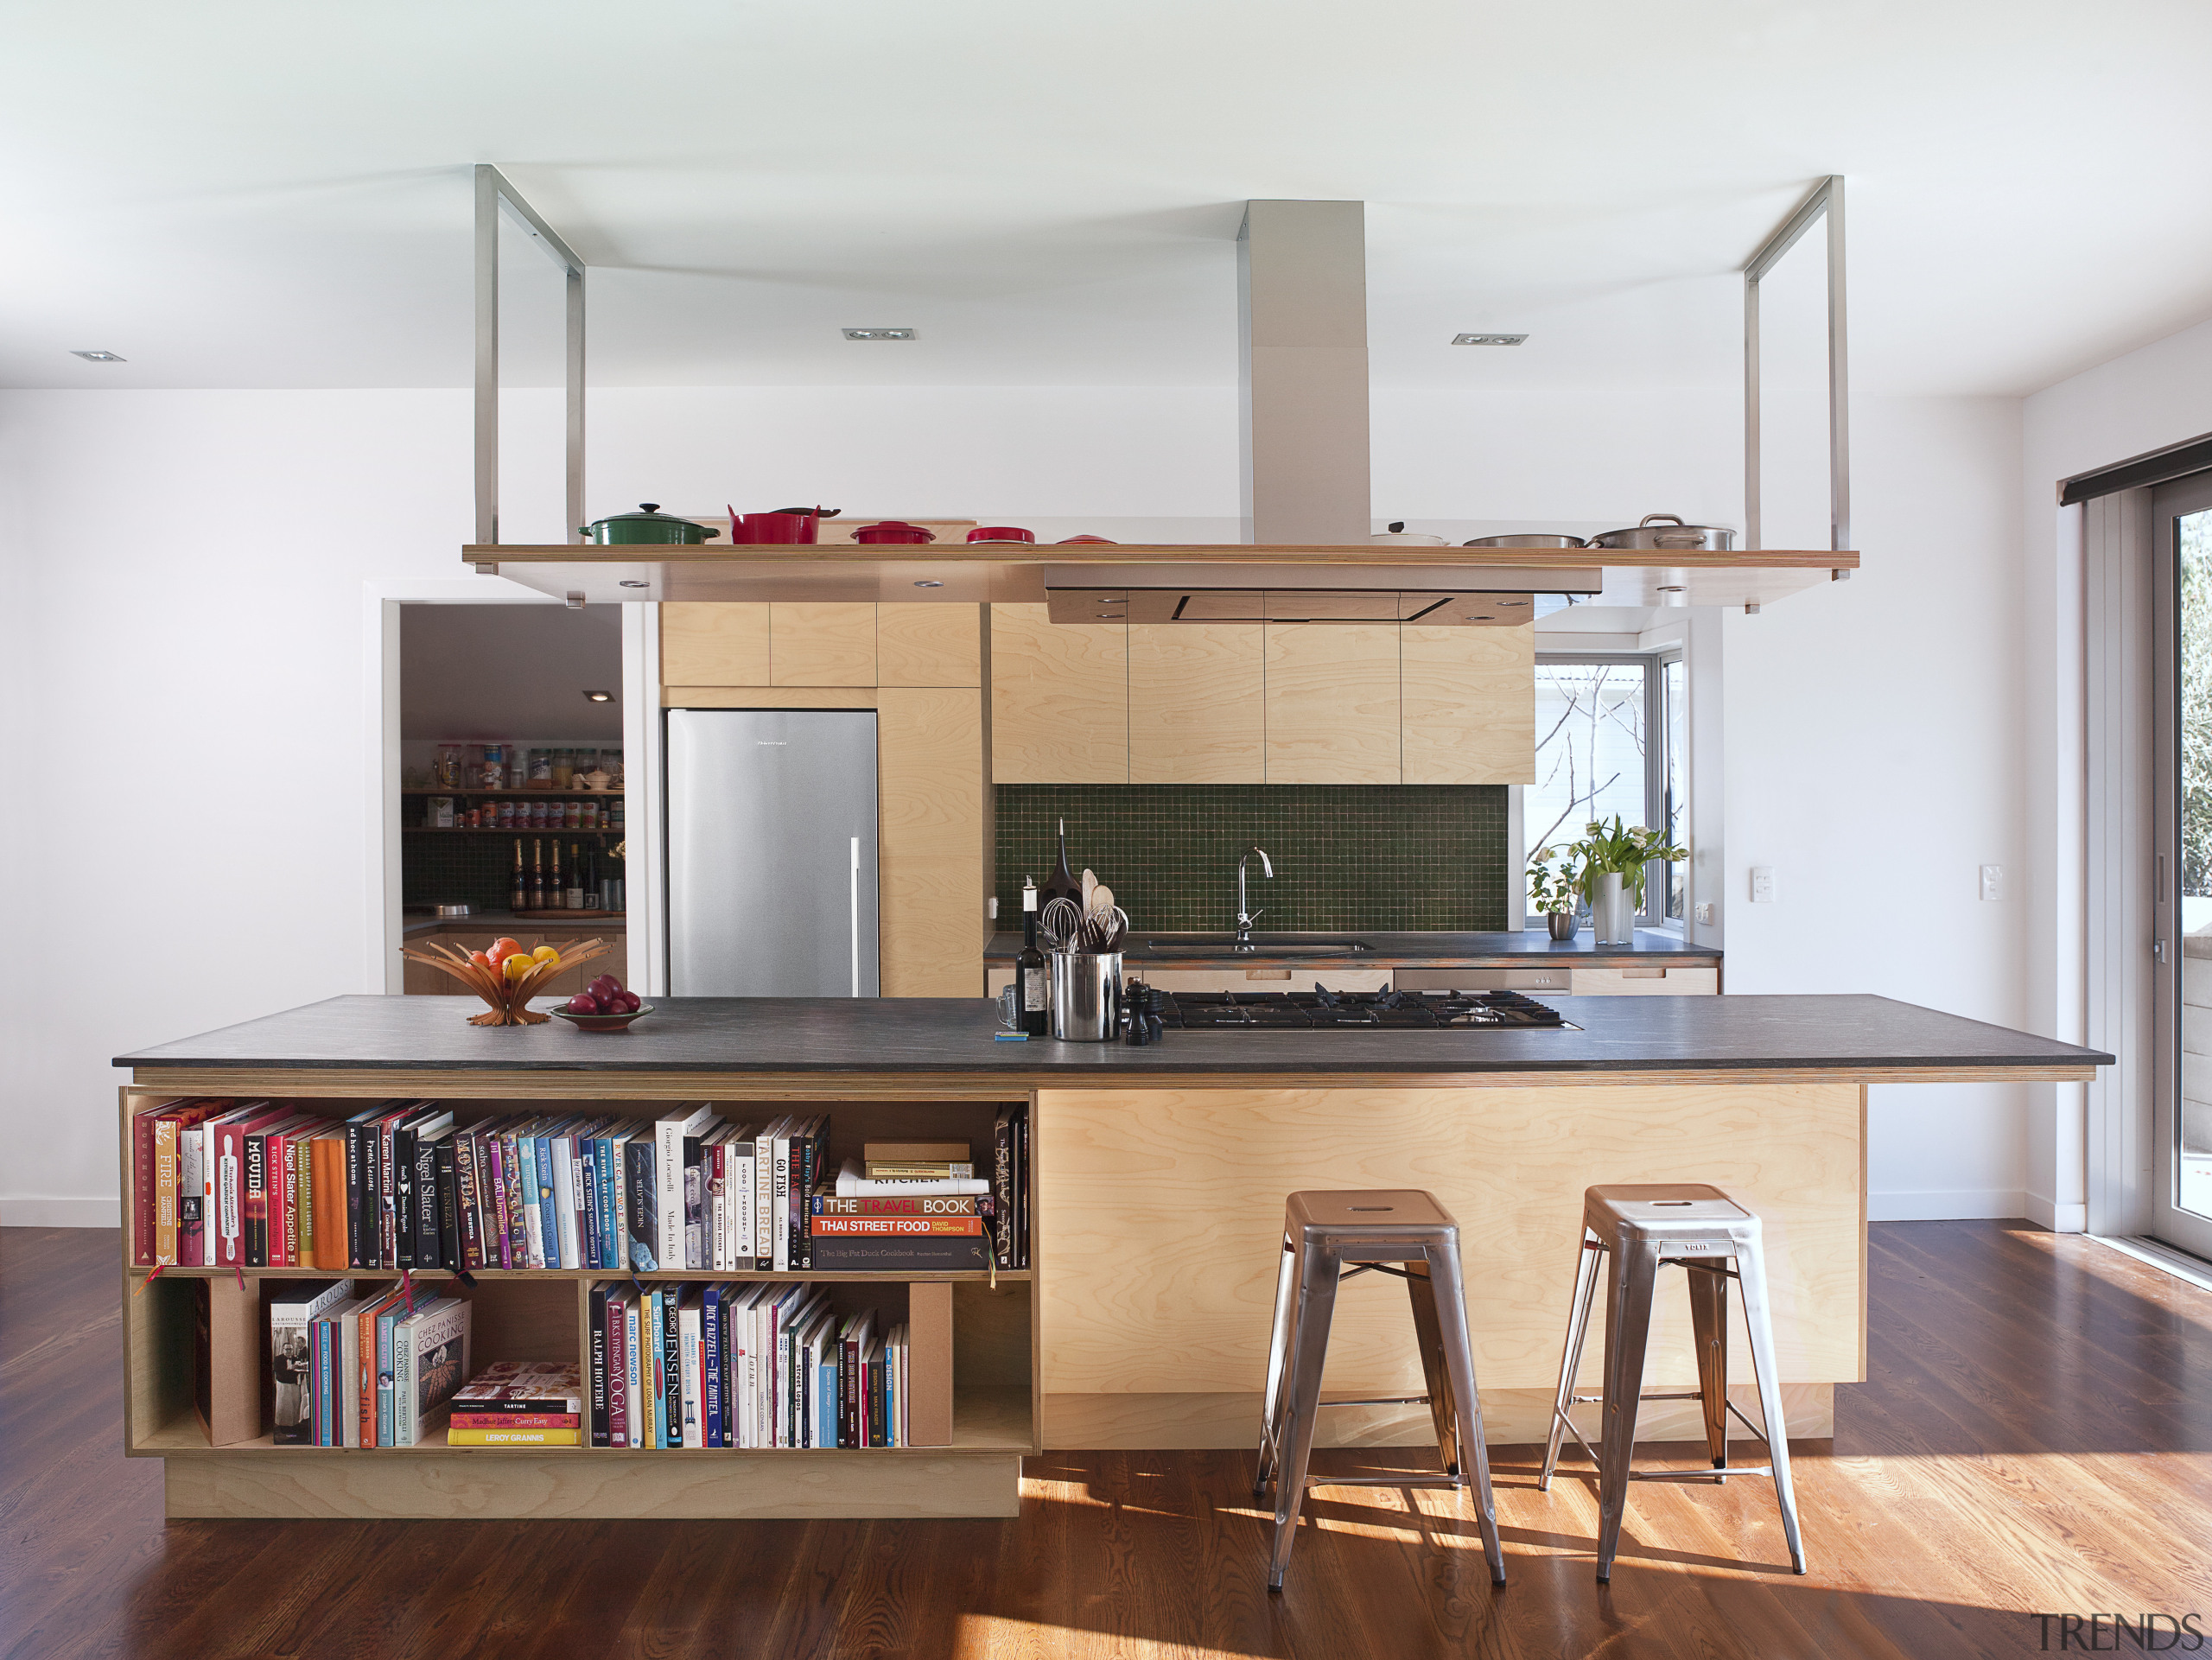 From a warm, long-grain birch design, to a cabinetry, countertop, furniture, interior design, kitchen, shelf, shelving, white